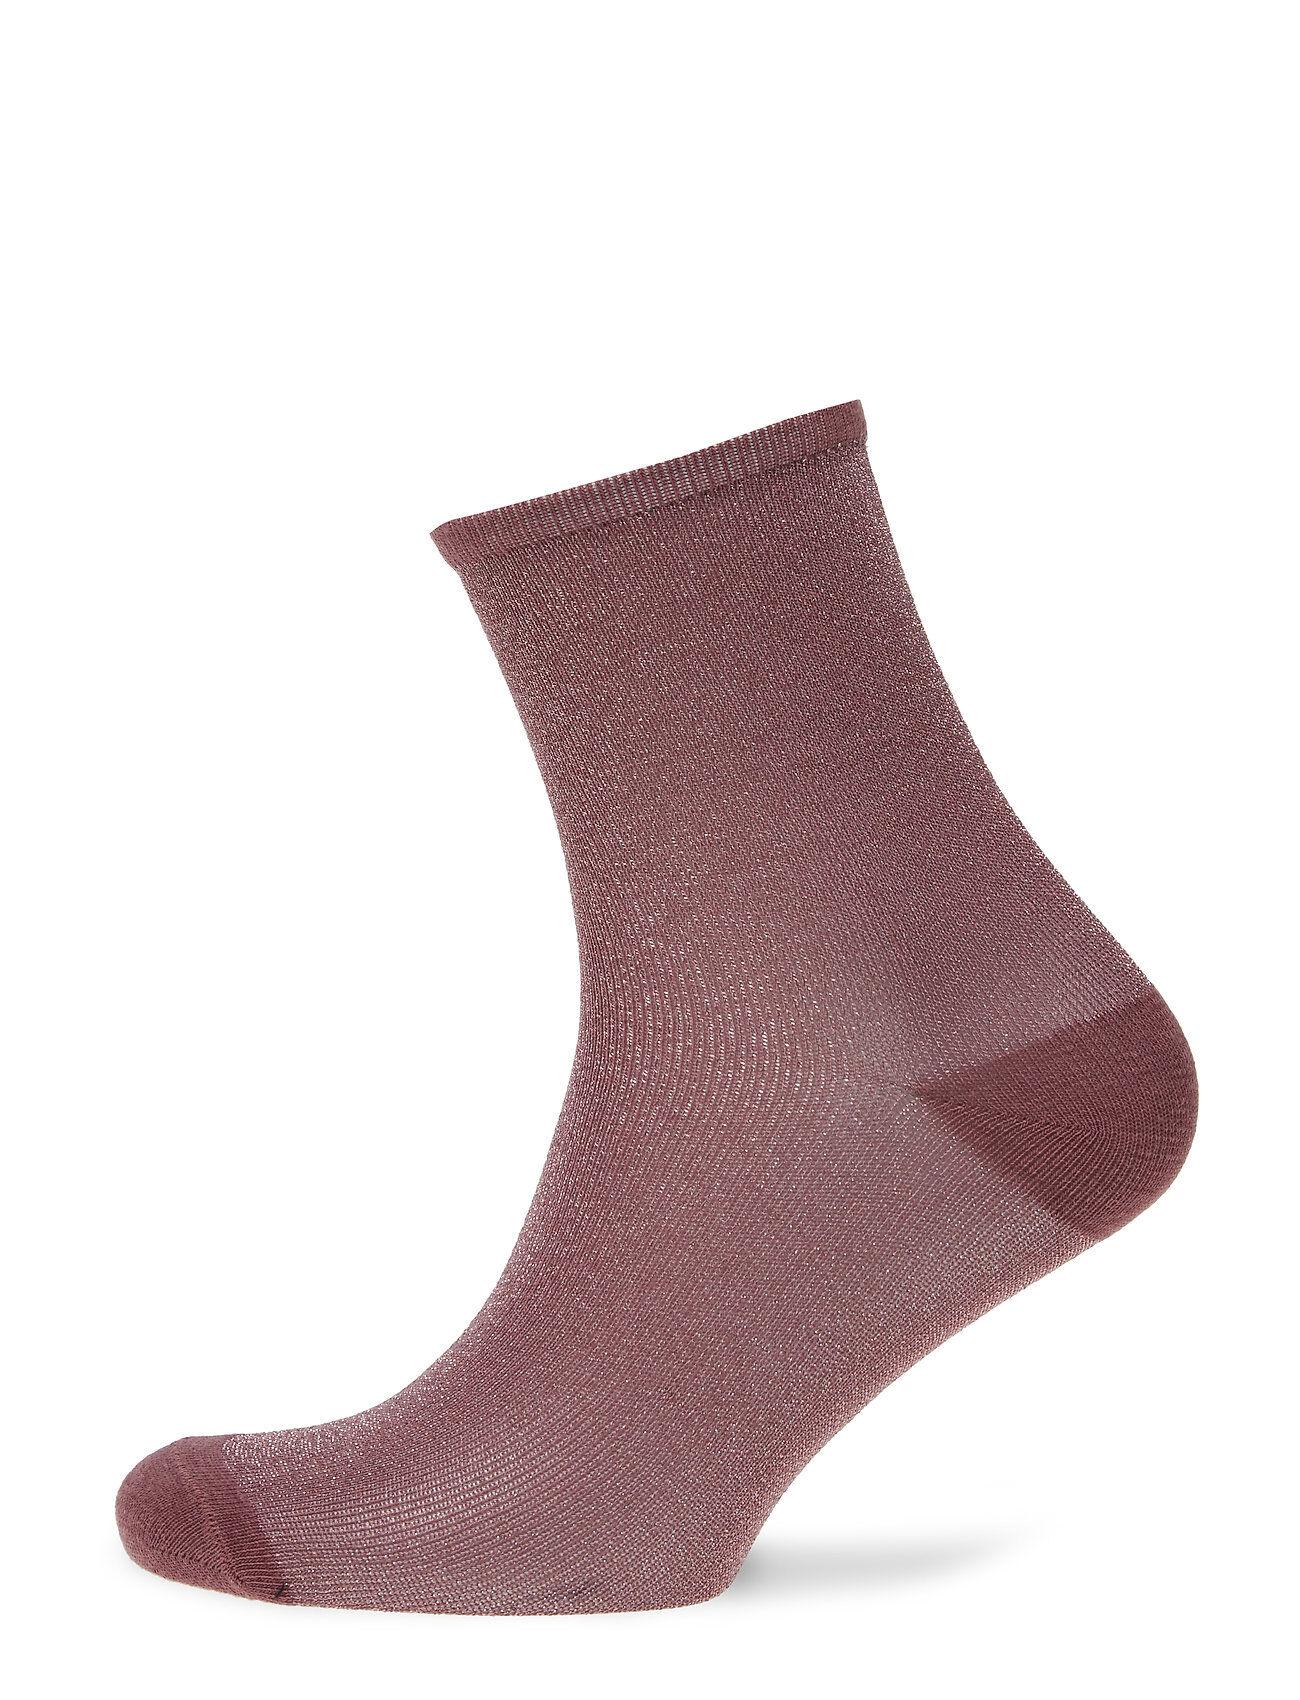 Becksöndergaard Dina Solid Lingerie Hosiery Socks Vaaleanpunainen Becksöndergaard